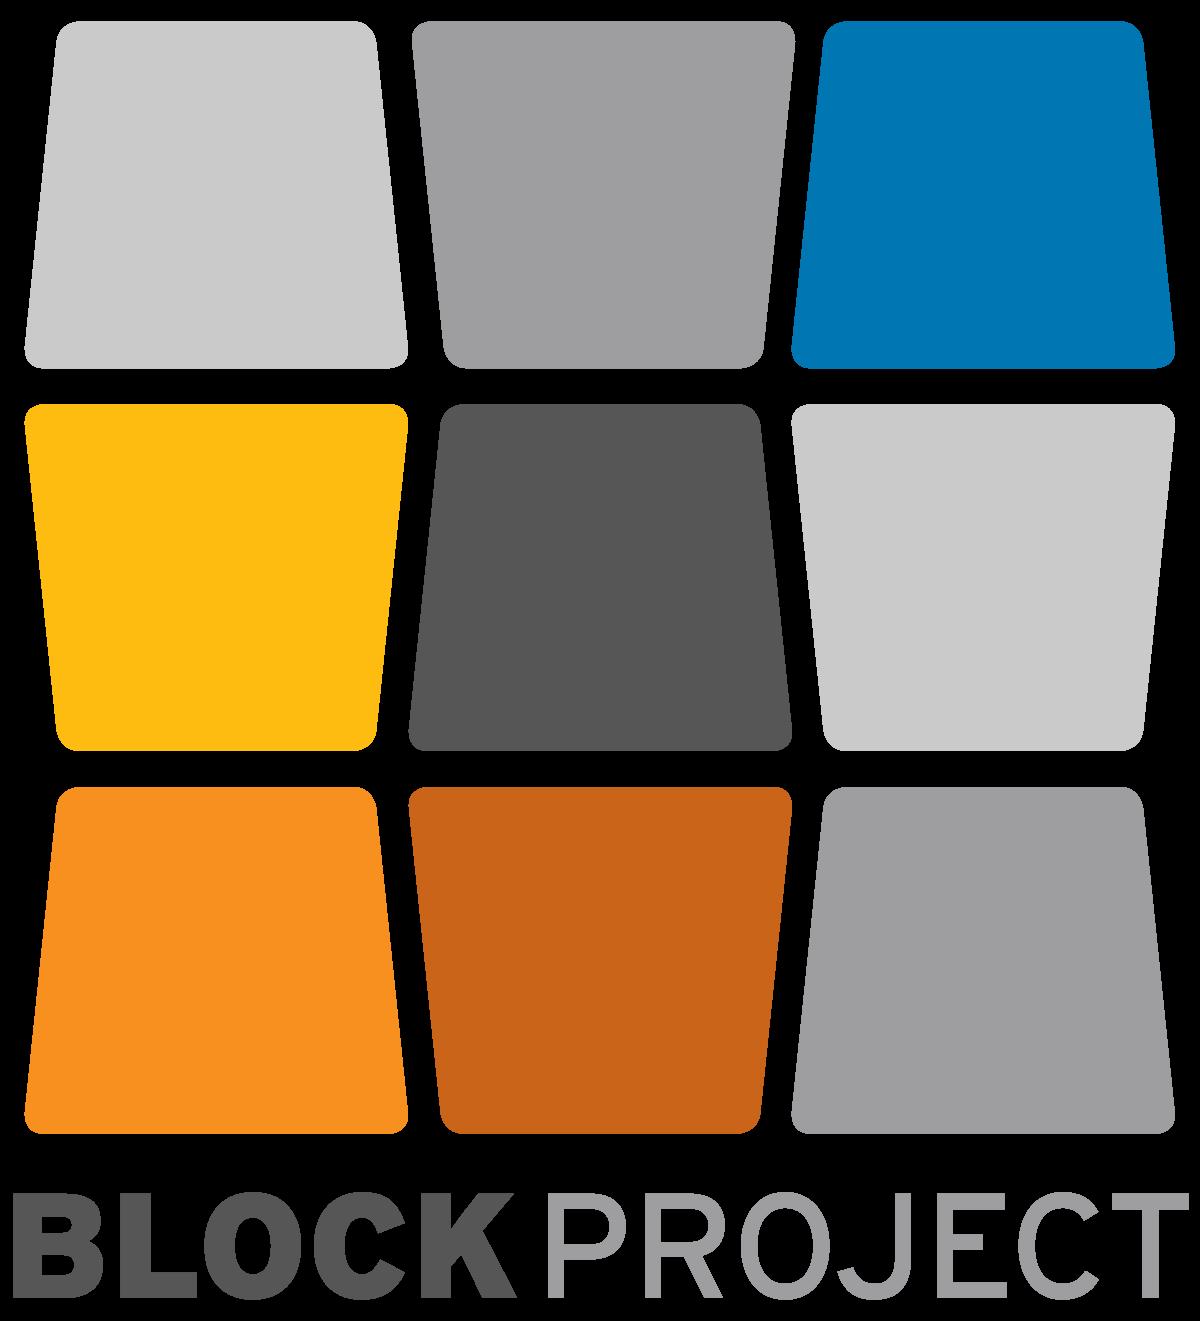 Number 1 clipart block. The project medium